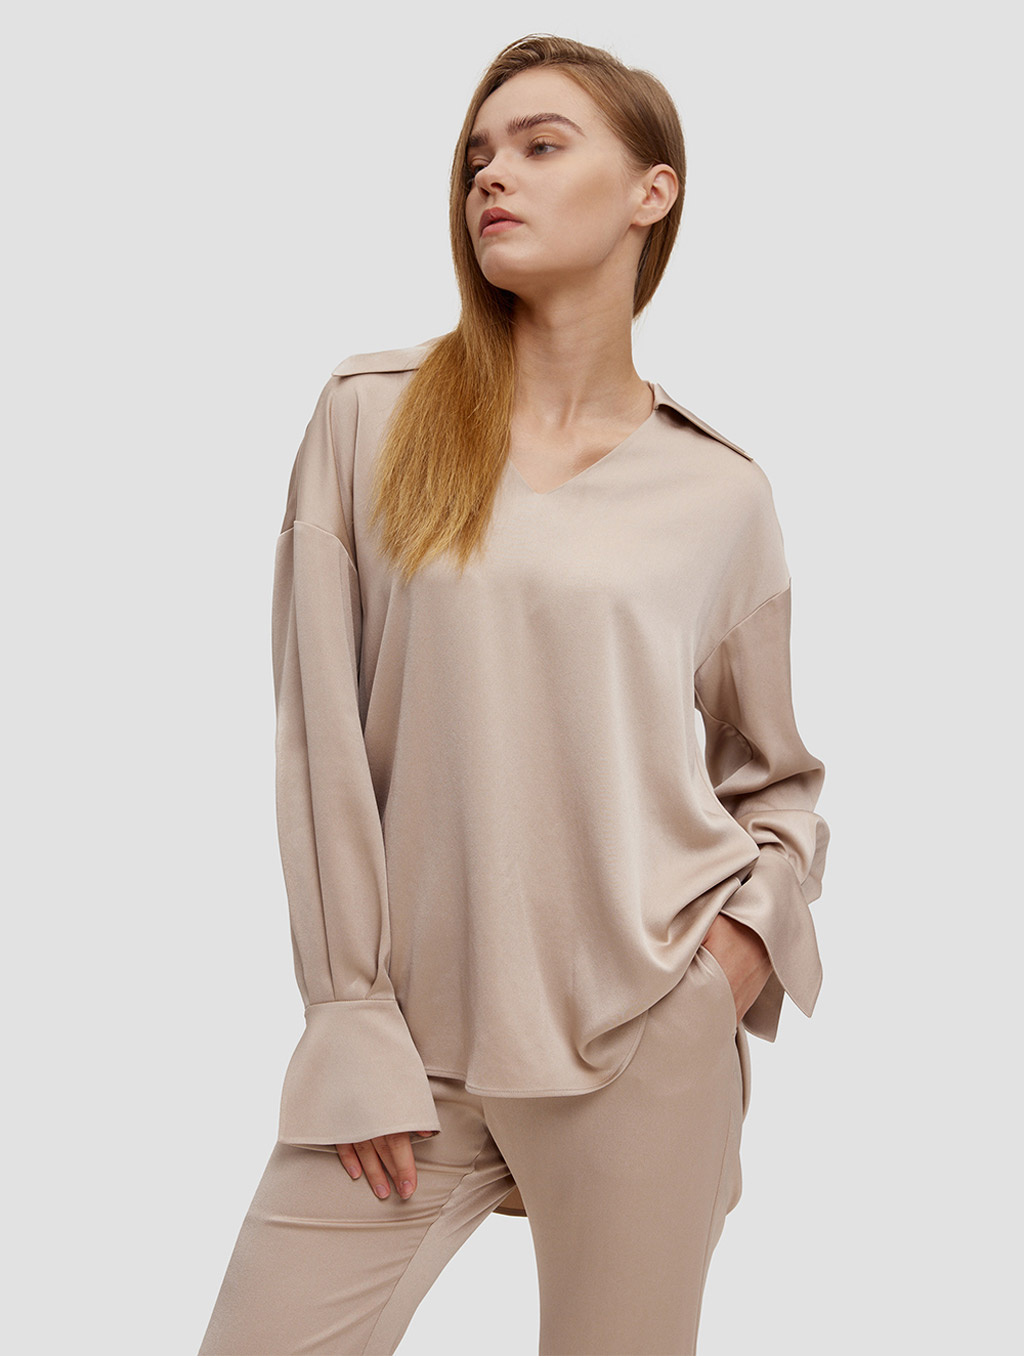 Buttoned Cuff Blouse - positive- light camel1